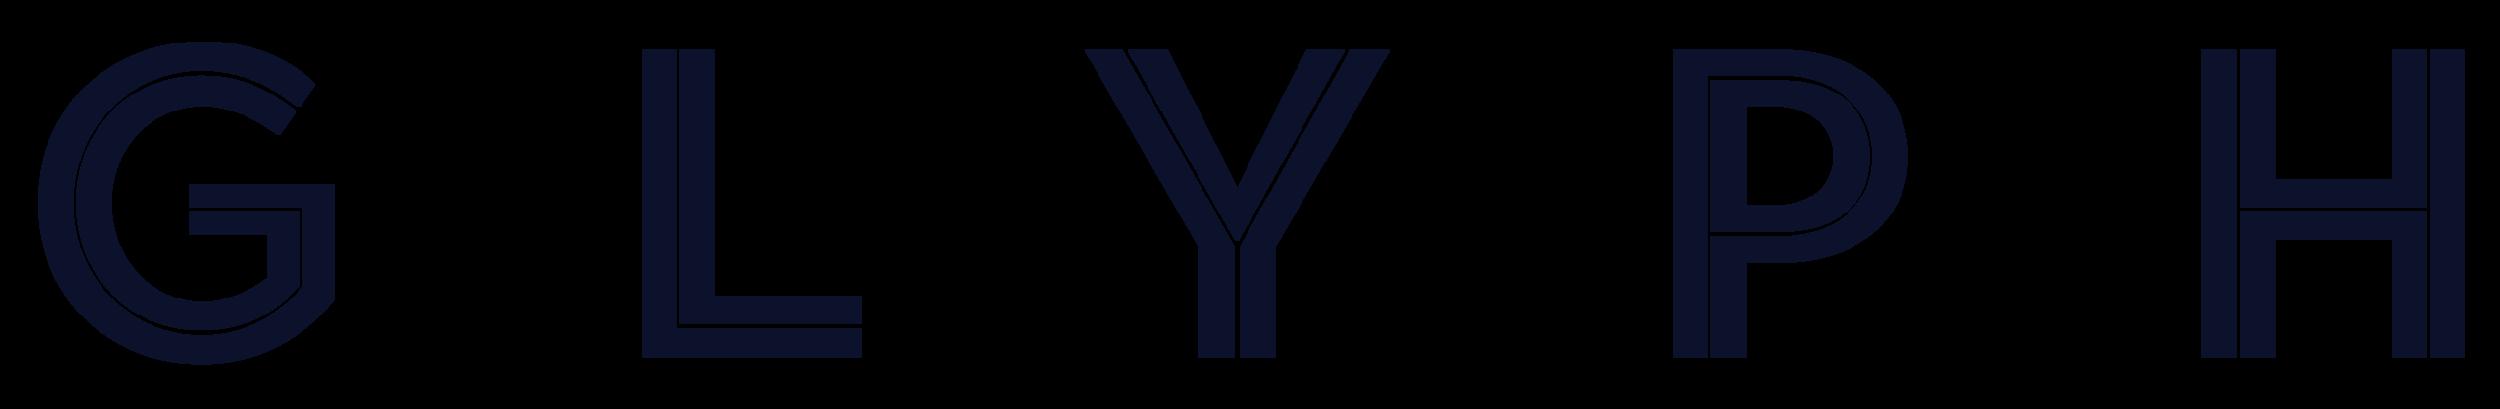 Glyph_Wordmark_Blue.png